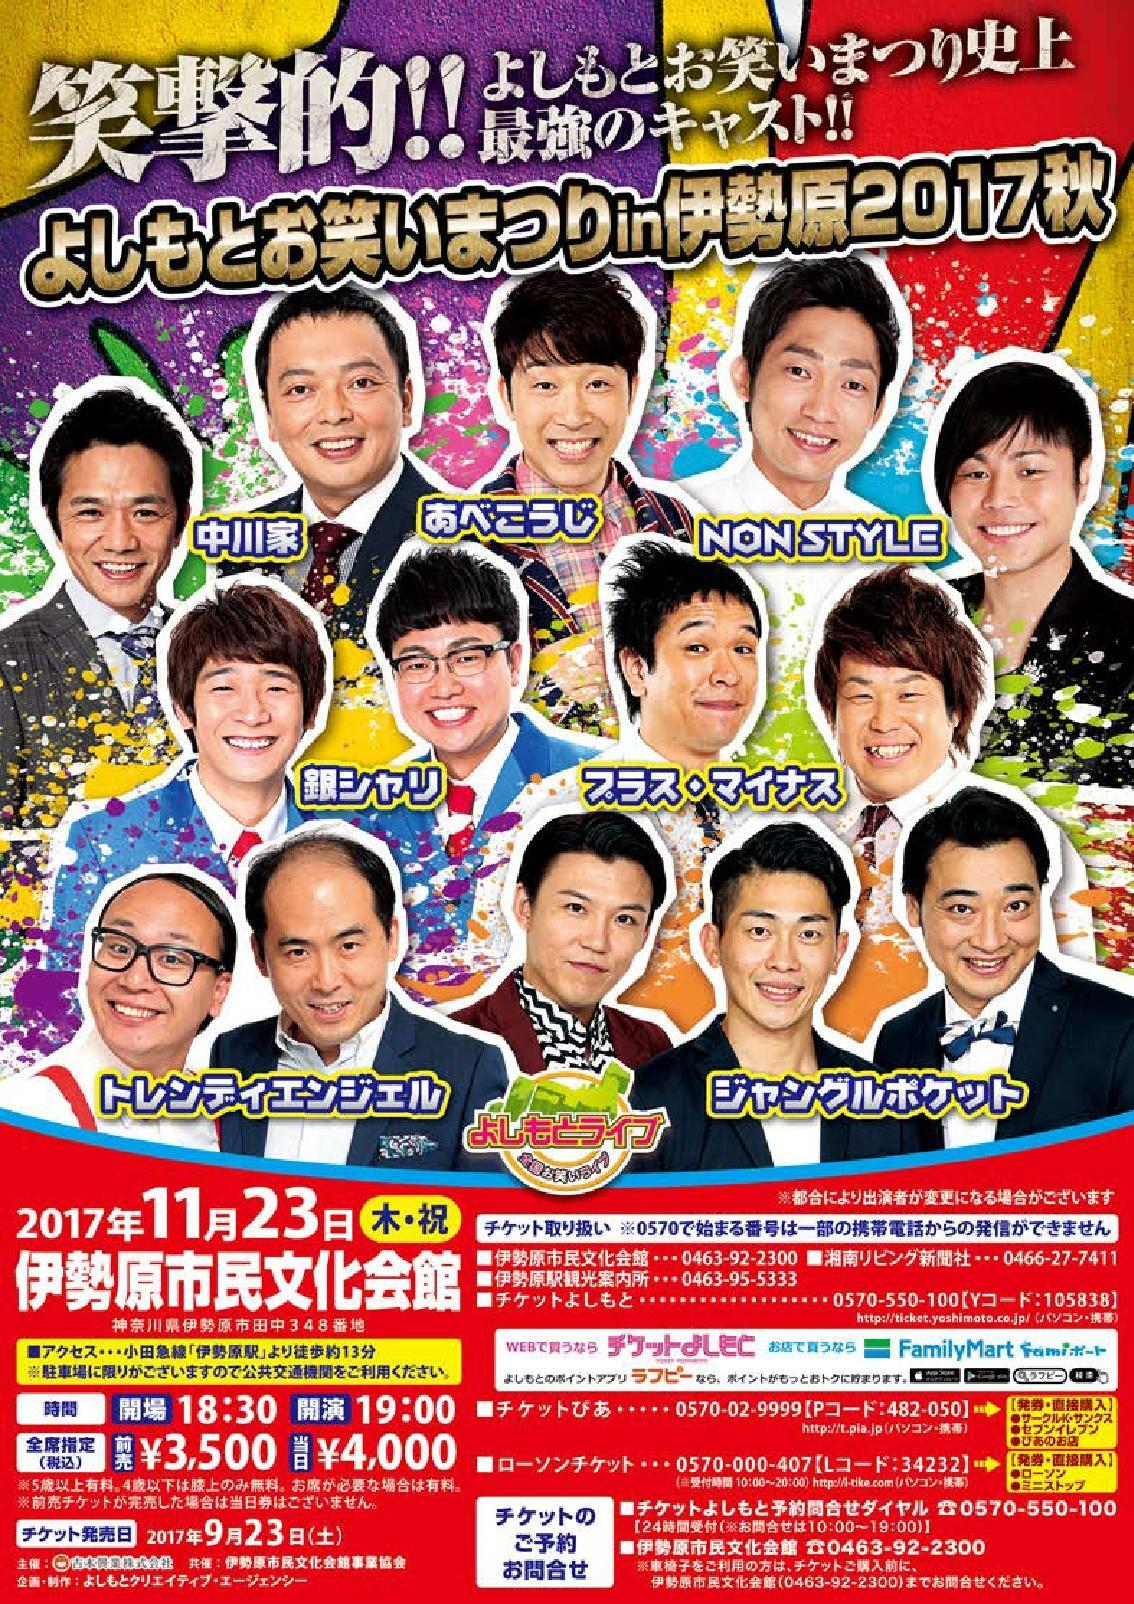 http://www.syumatsu.jp/20170920103302-759047bba671817d25dfba33d694fc79468fbeee.jpg